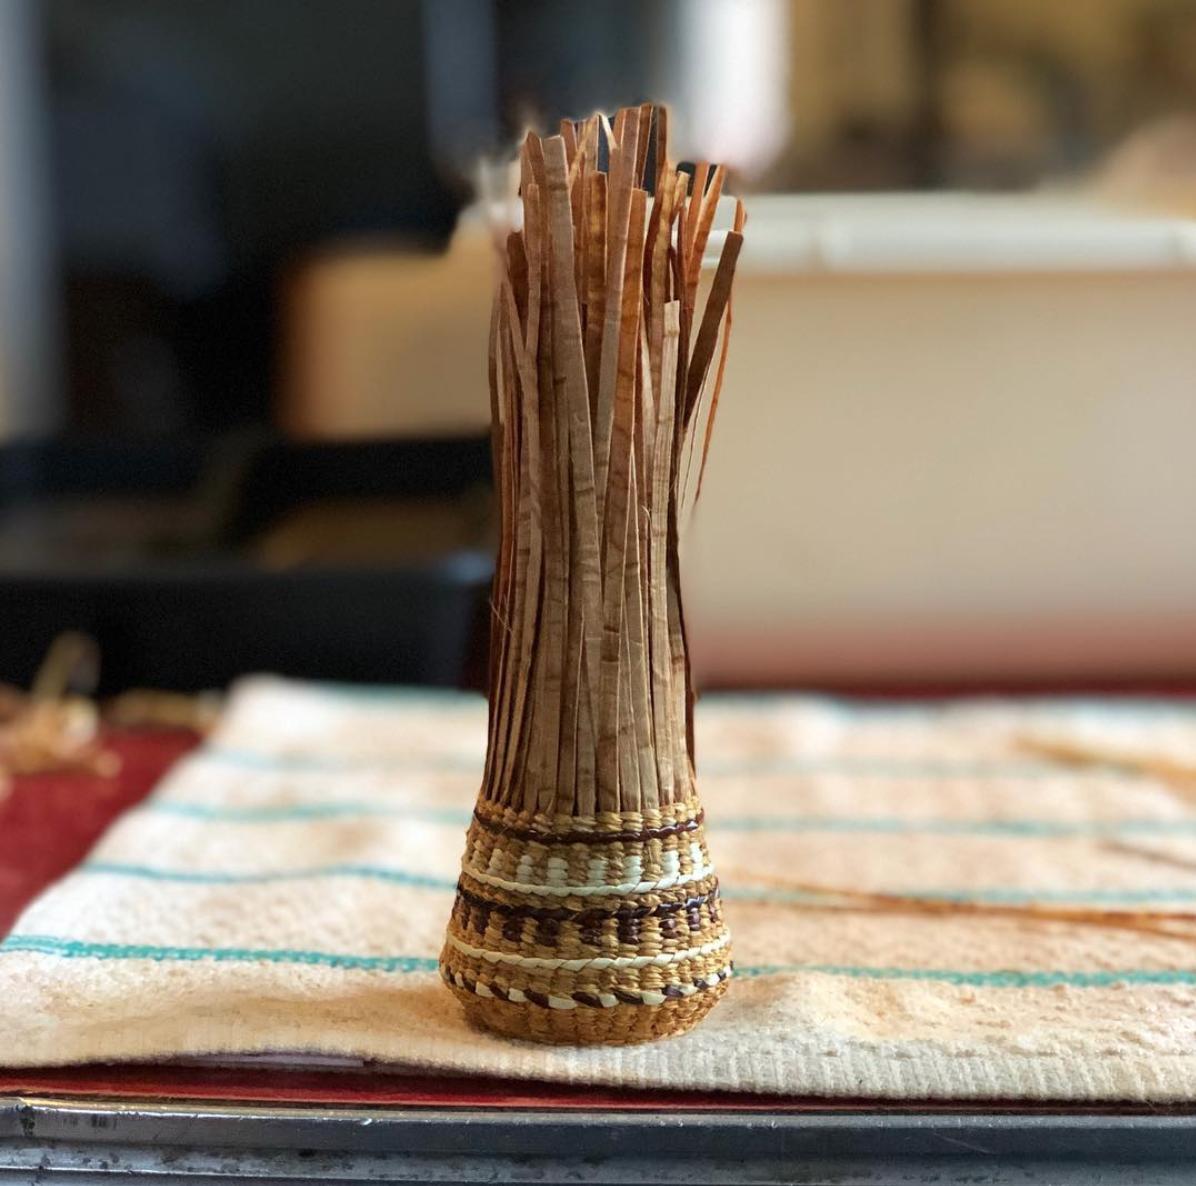 Basket and photo by Kandi McGilton (Metlakatla Indian Community)